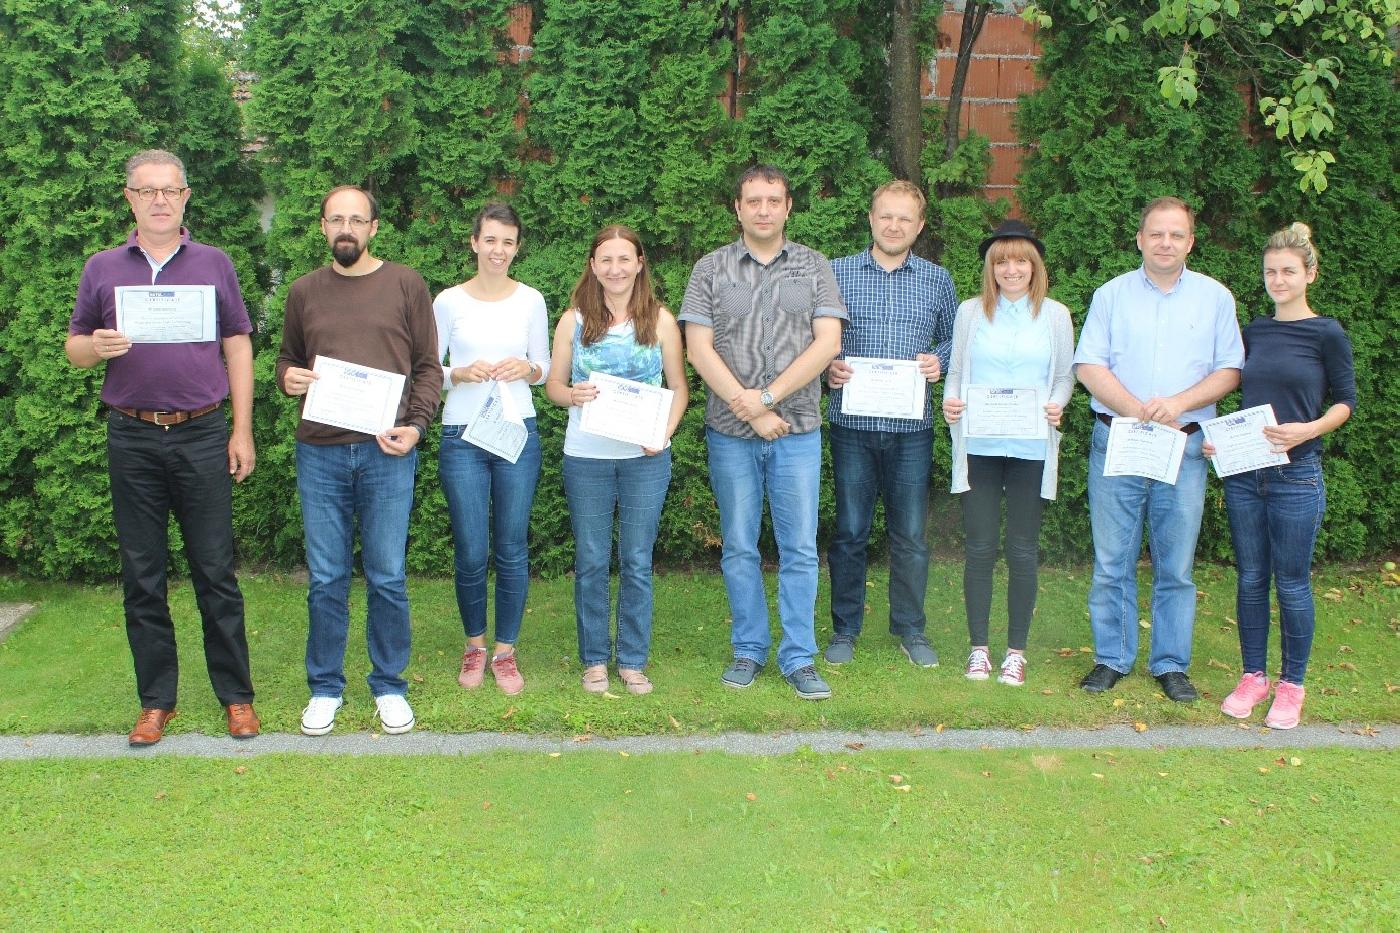 Održana GIS obuka za zaposlenike Una Consulting-a